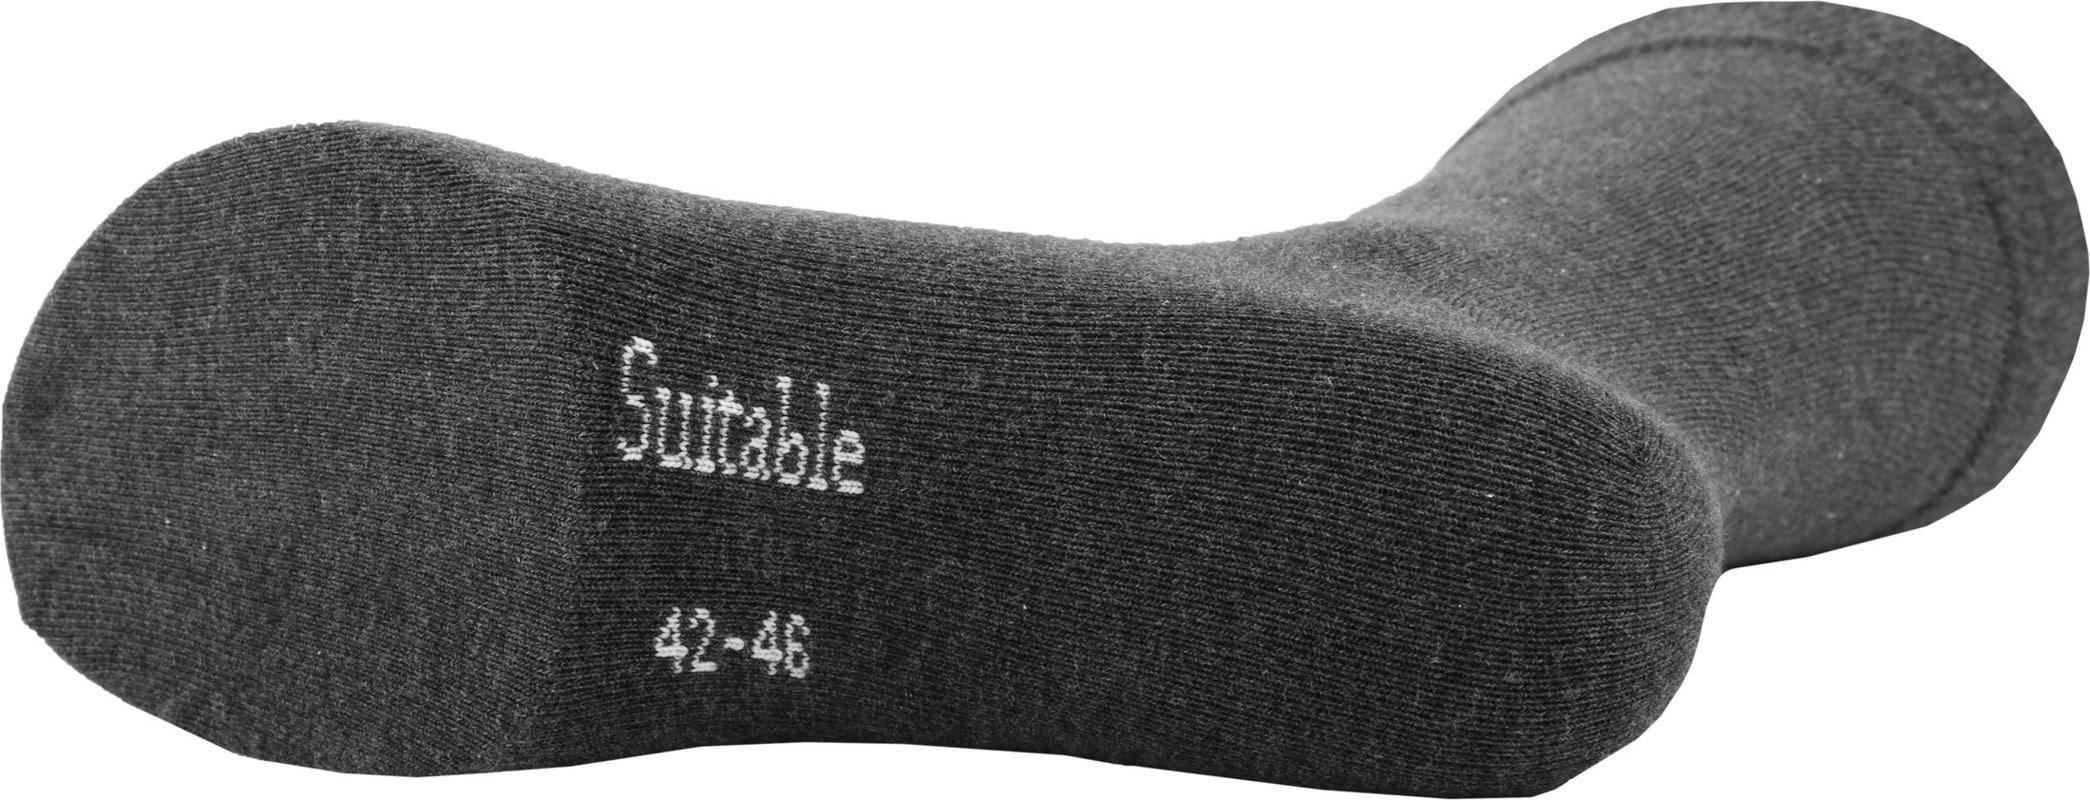 Suitable Bio Cotton Socks Dark Grey 6-Pack photo 3